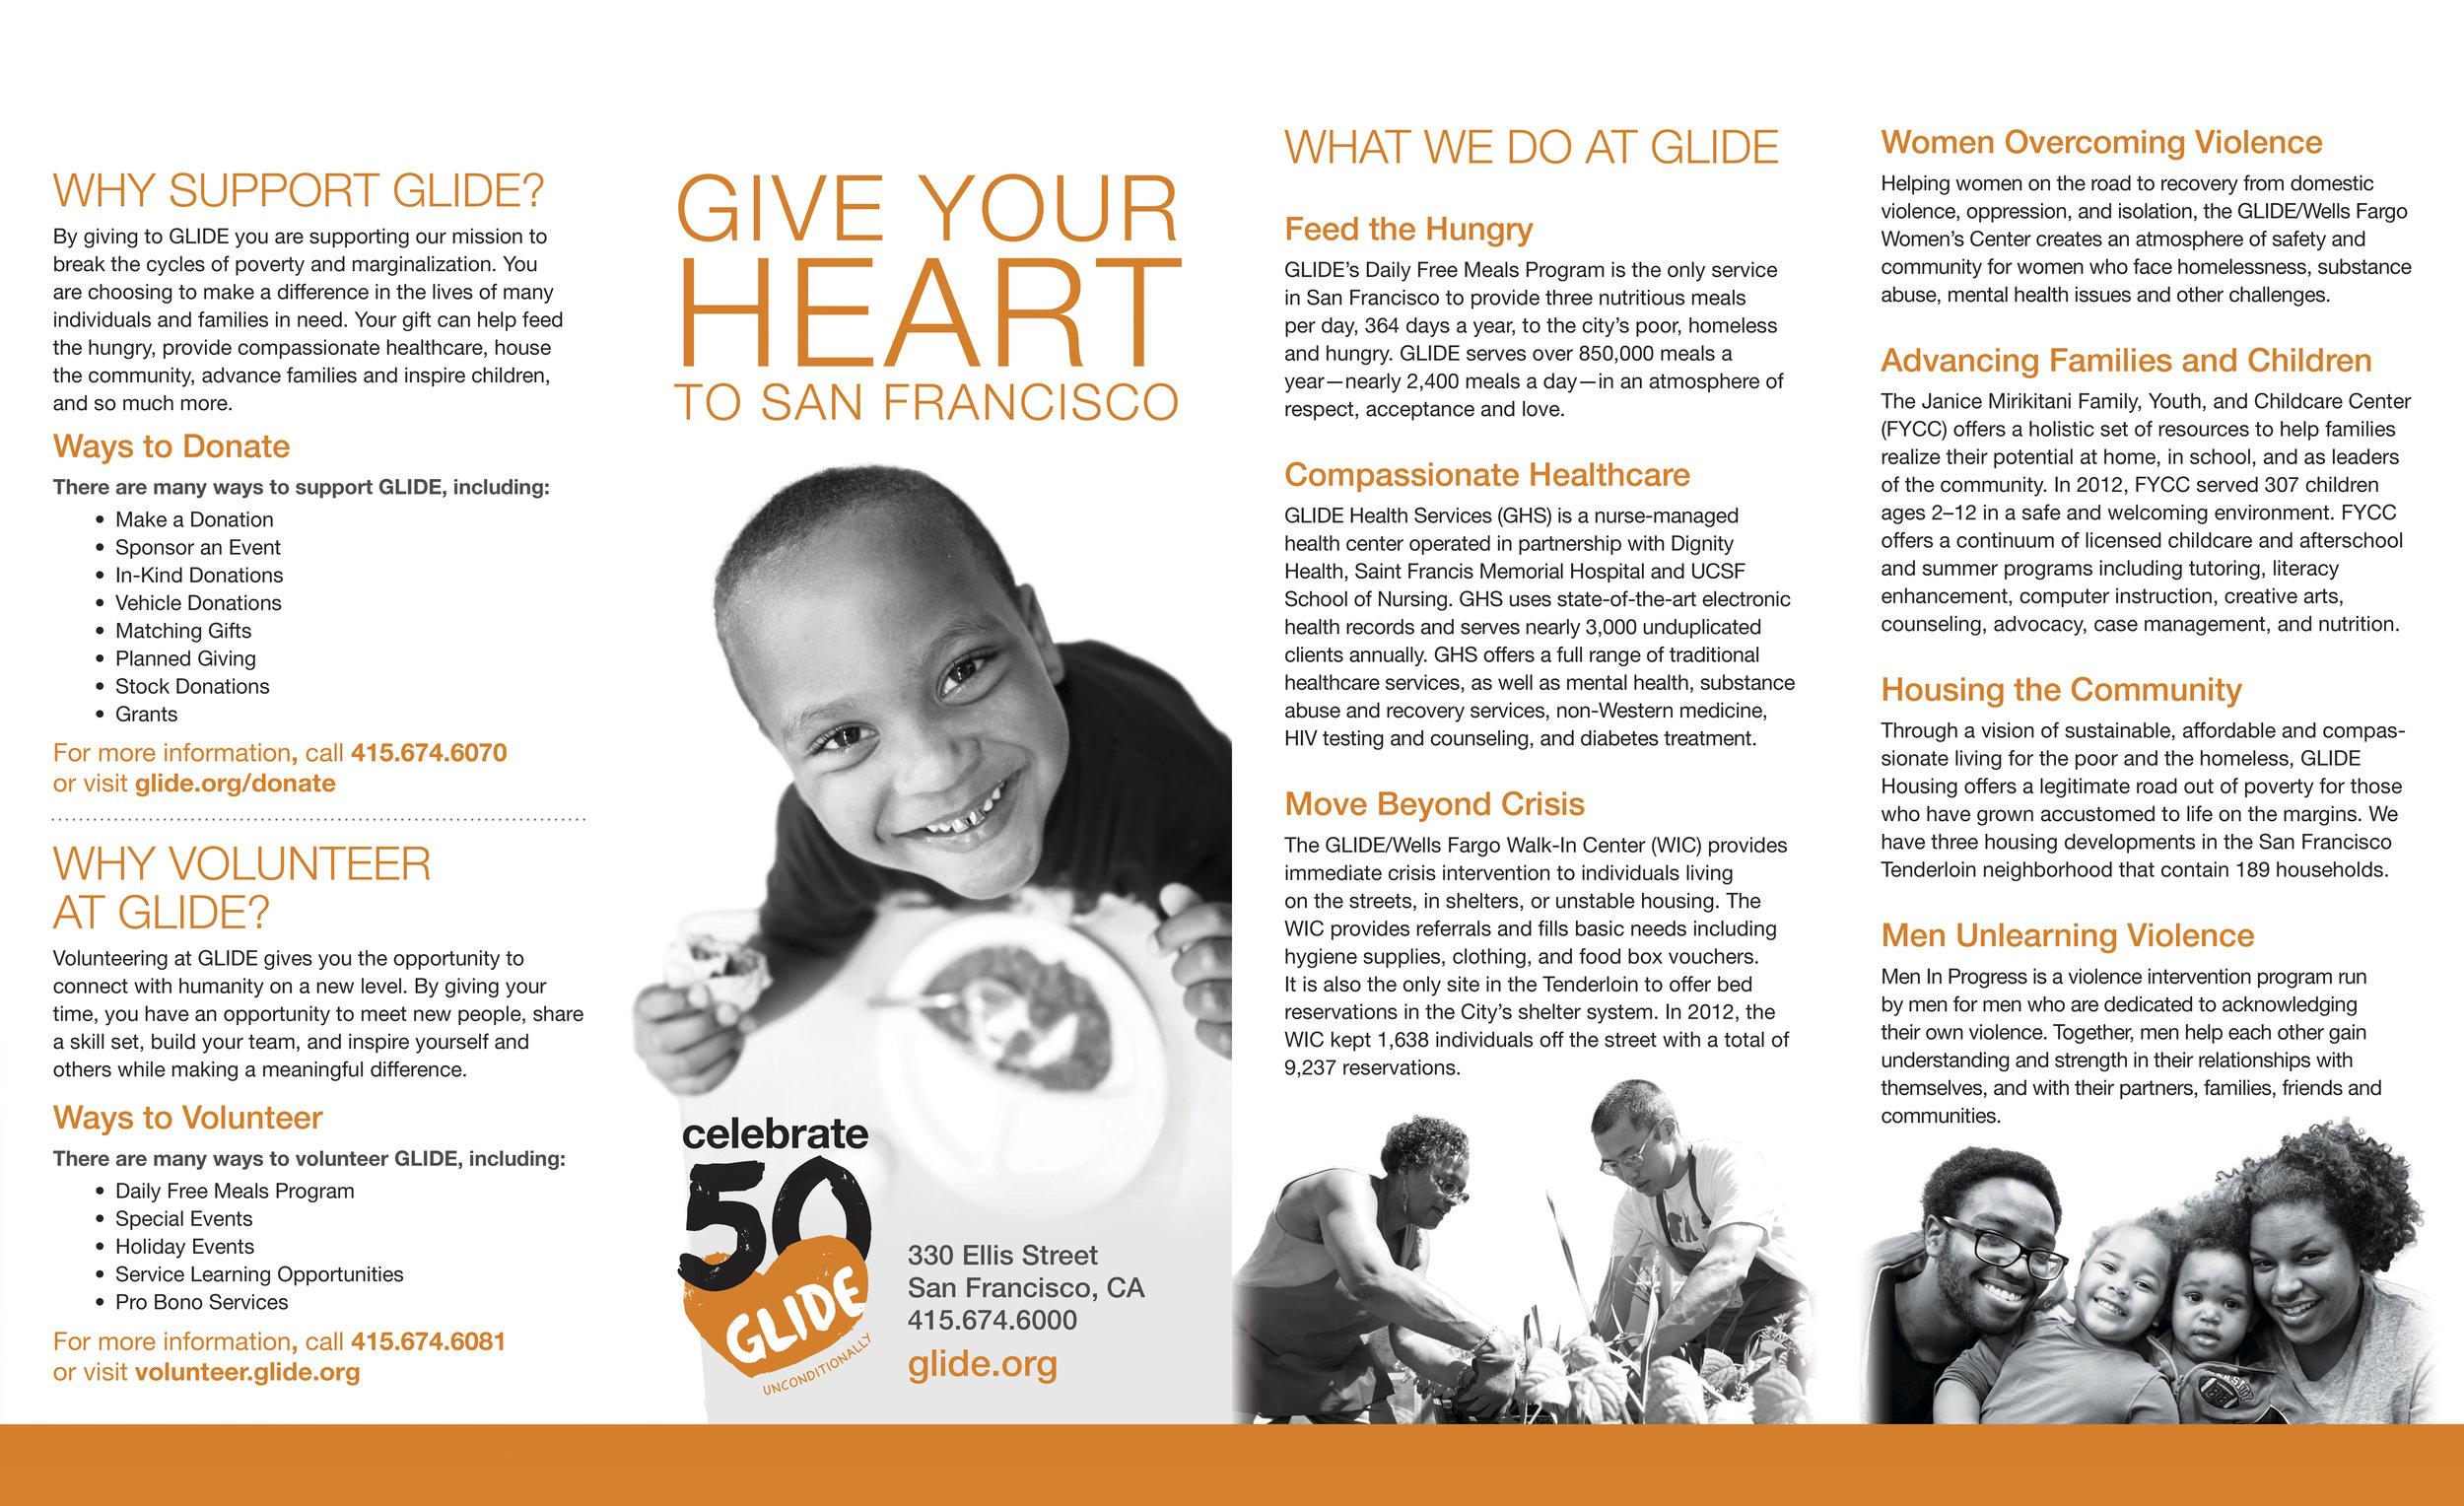 GLIDE_brochure.jpg